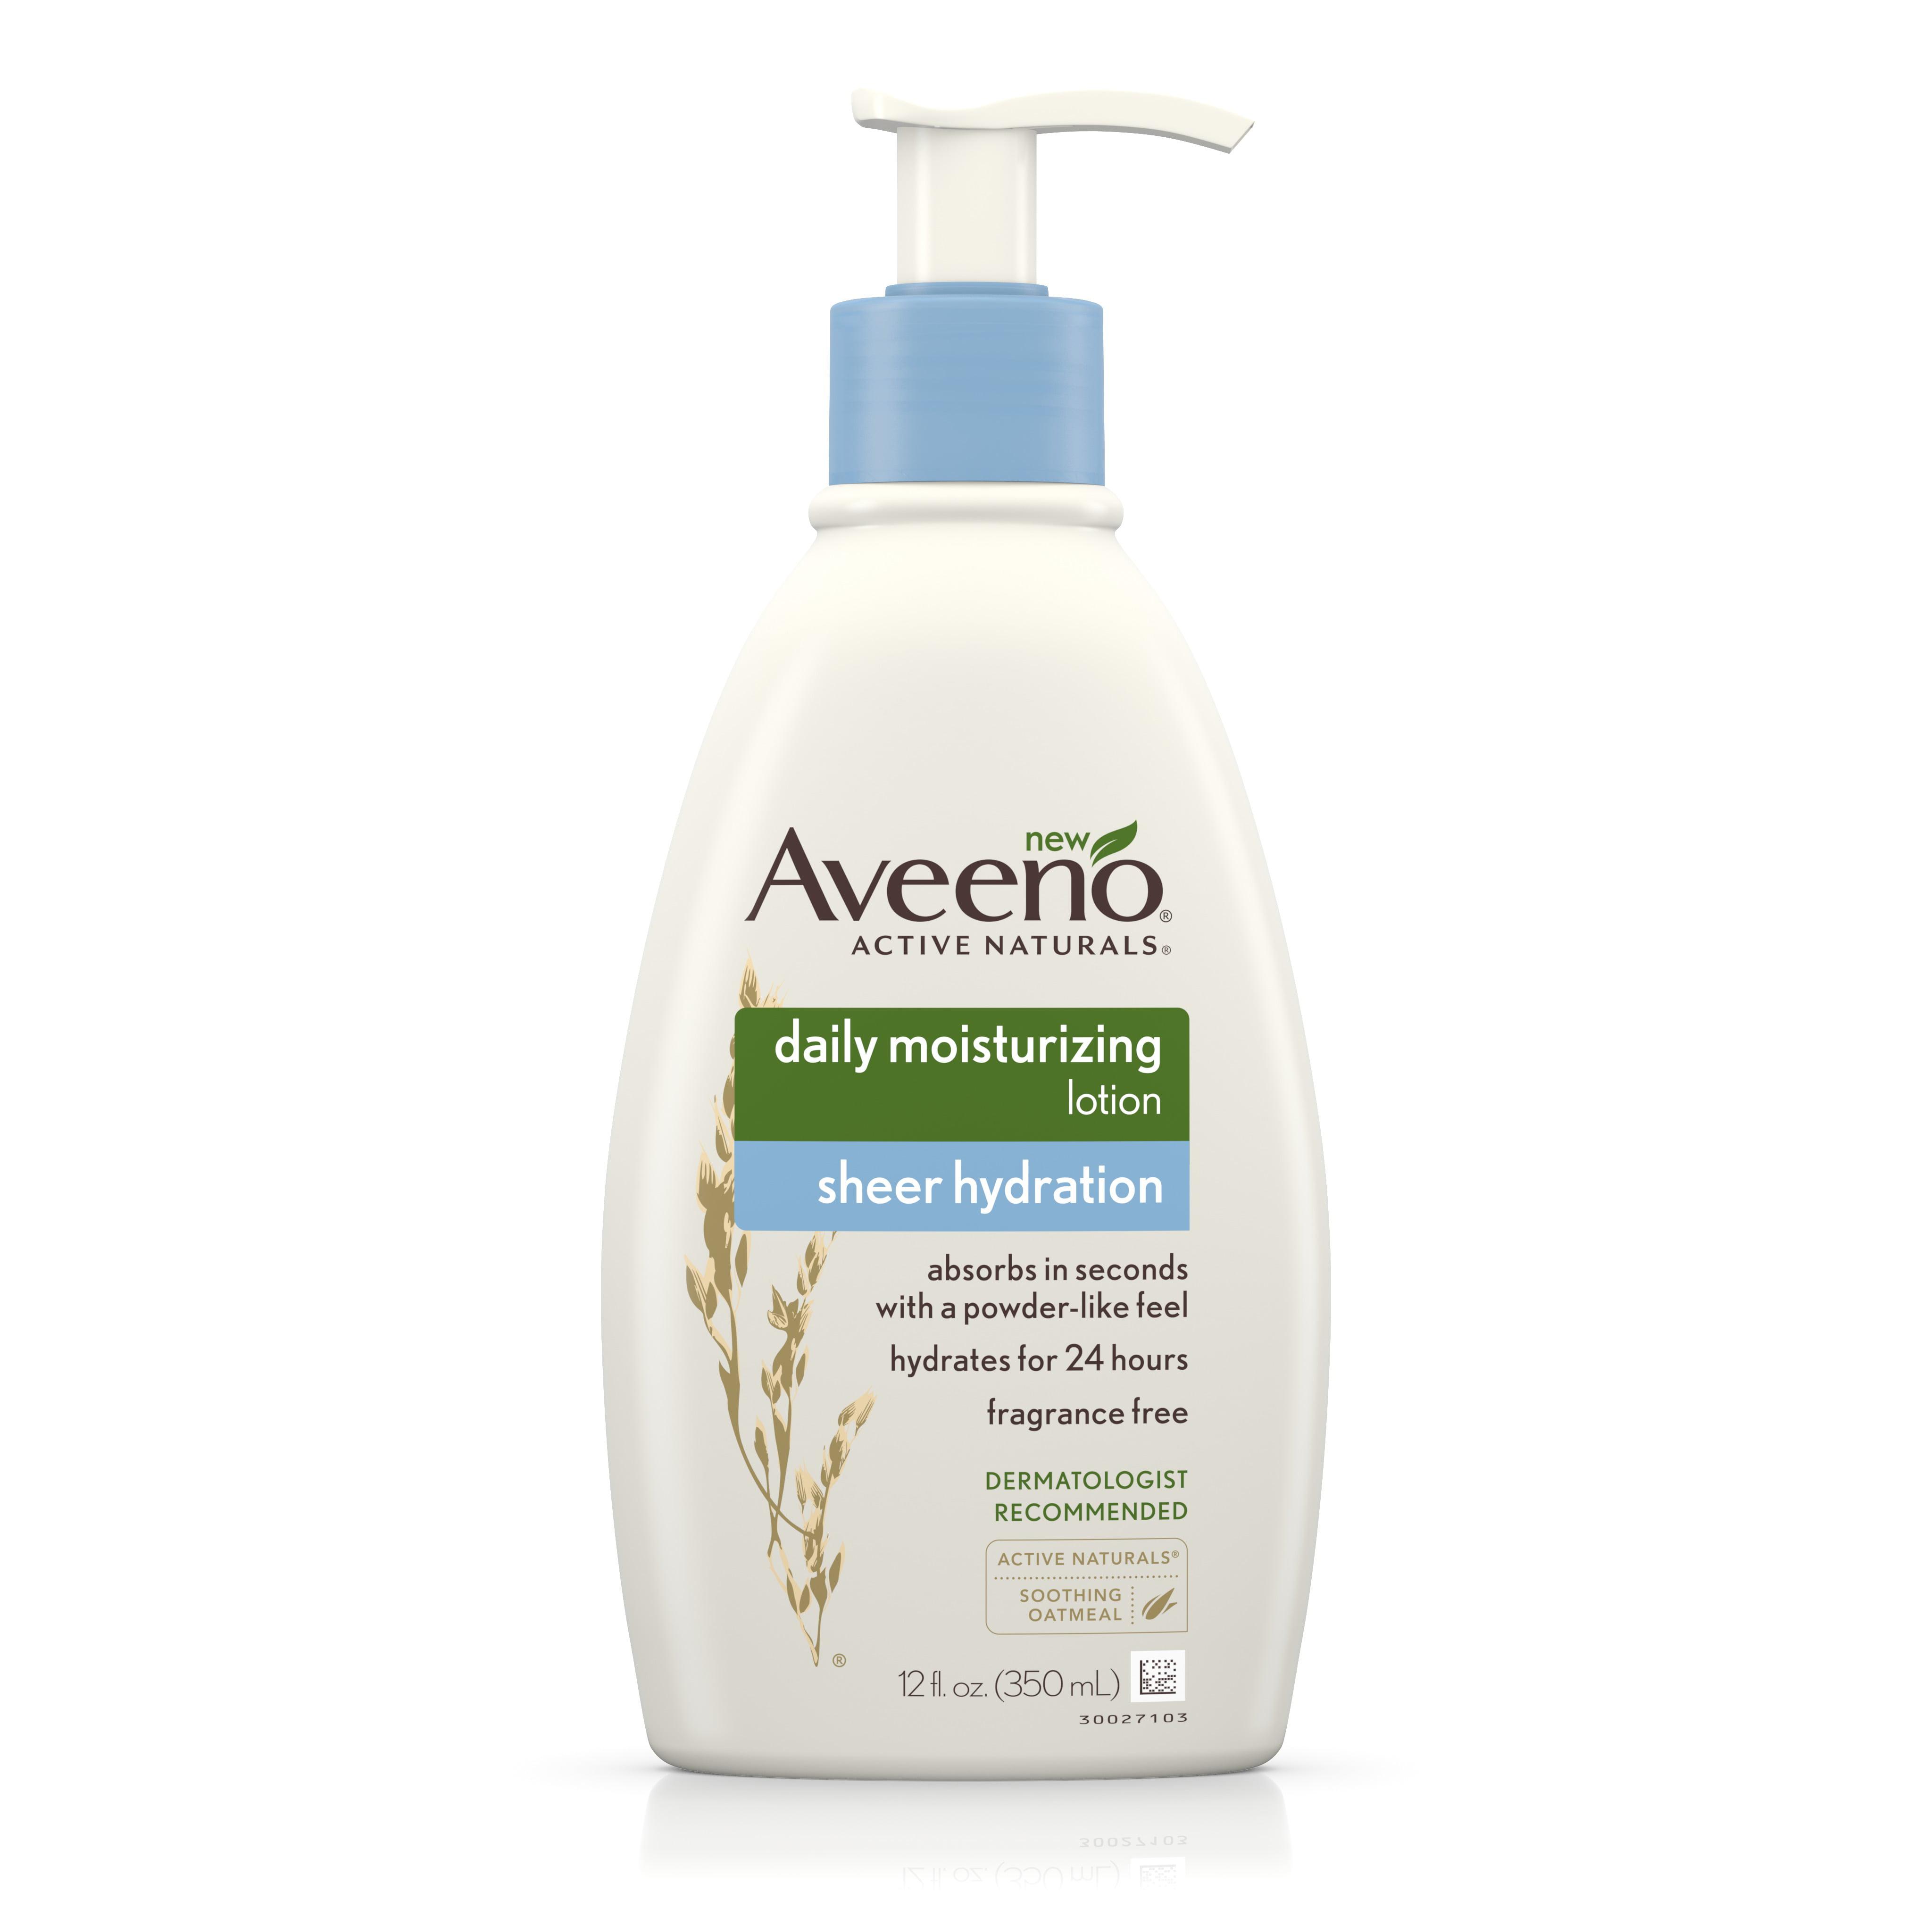 Aveeno Sheer Hydration Daily Moisturizing Lotion, 12 Fl. Oz - Walmart.com